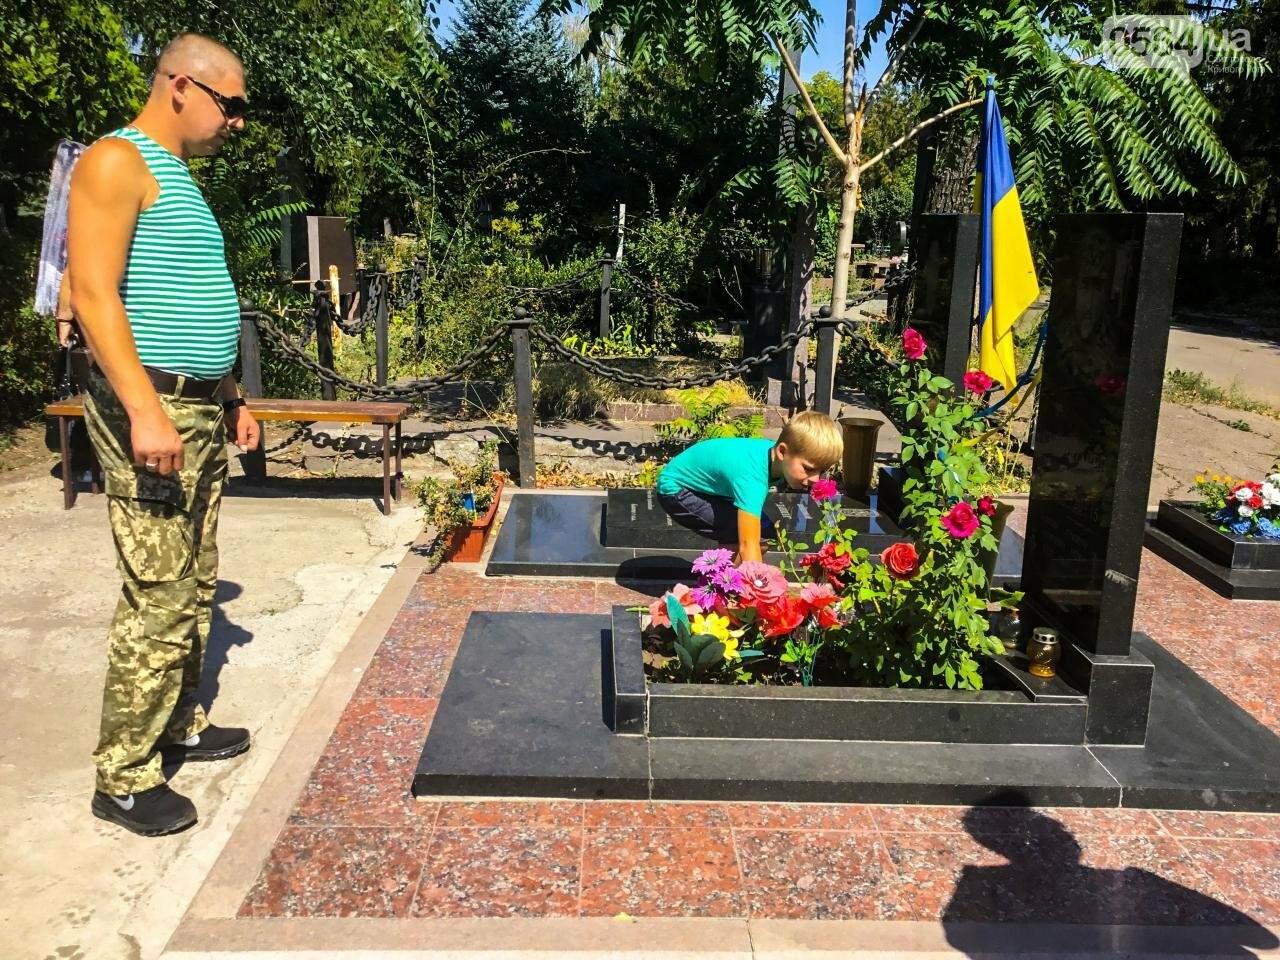 На Аллее Героев провели панихиду по погибшим в зоне АТО криворожанам, - ФОТО , фото-18